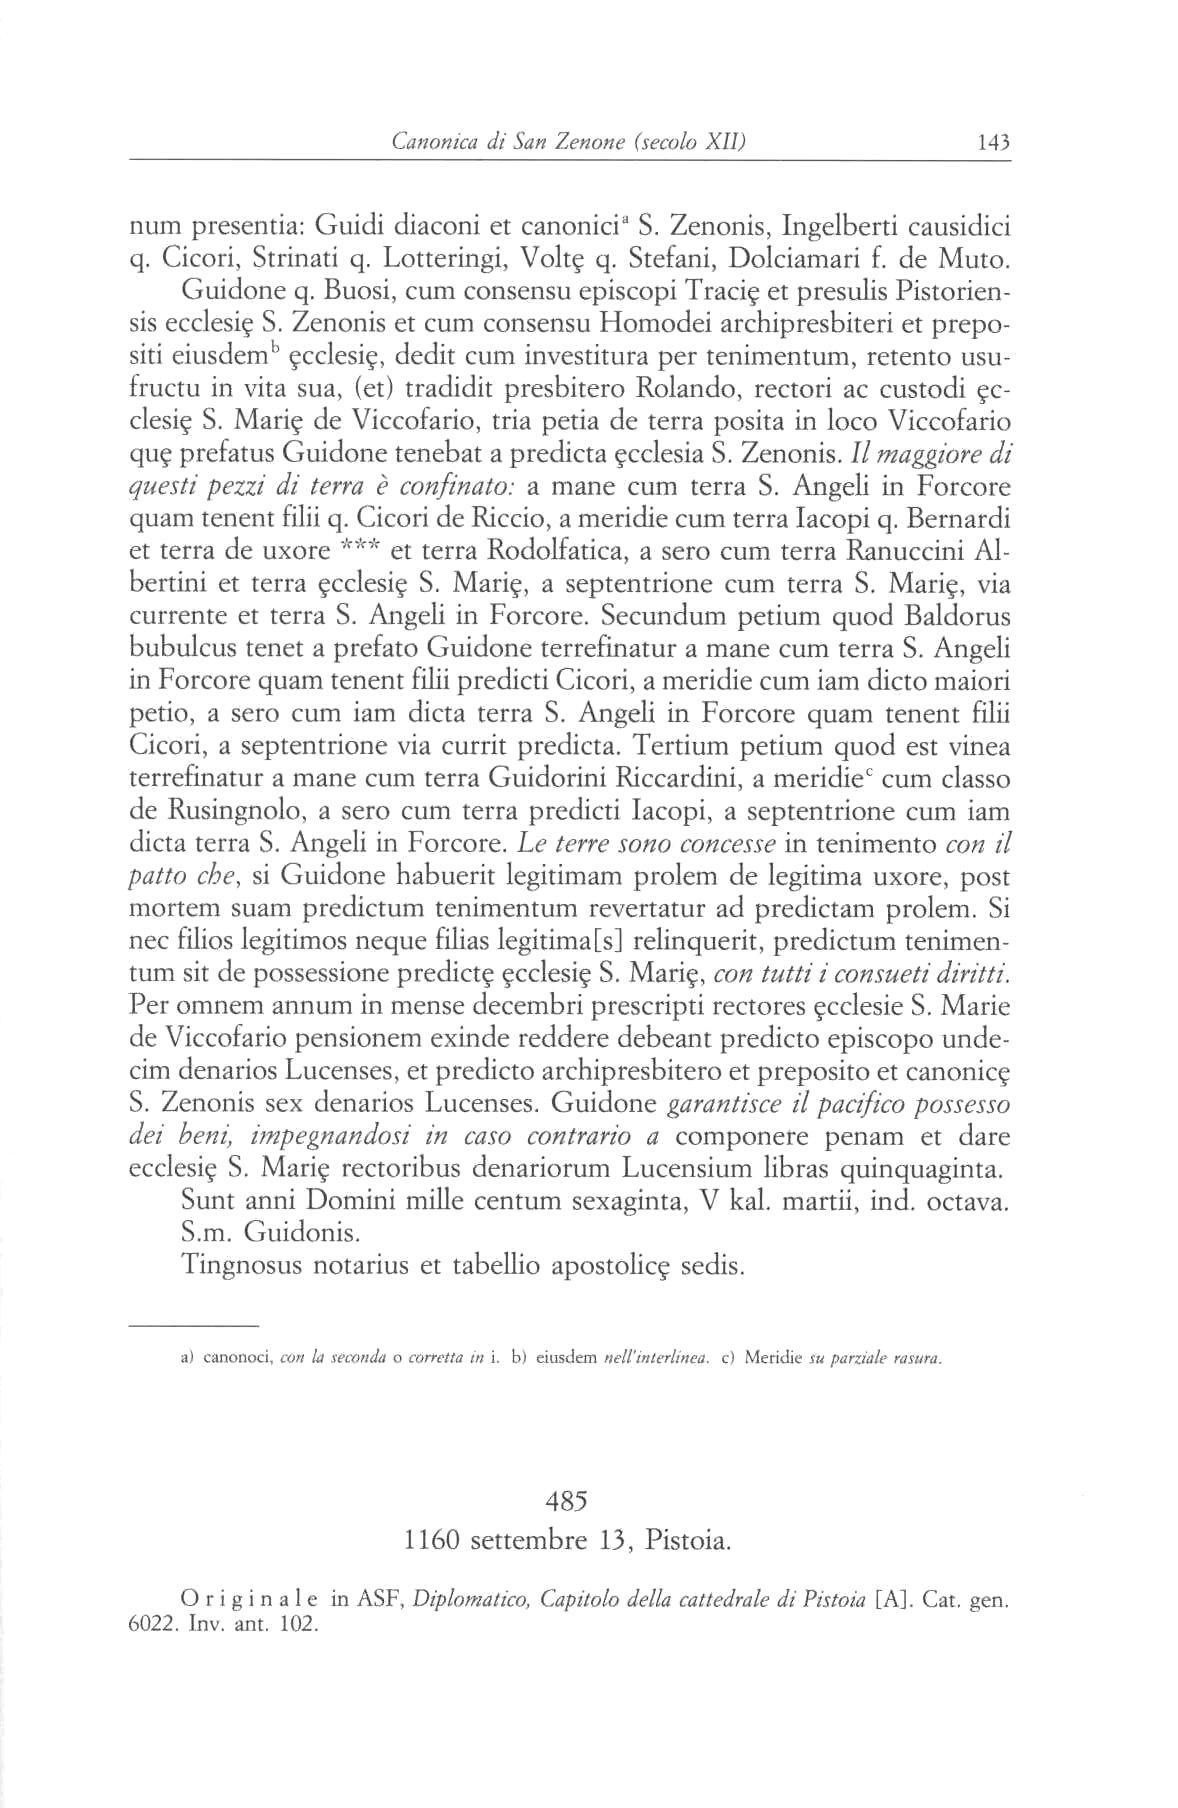 Canonica S. Zenone XII 0143.jpg